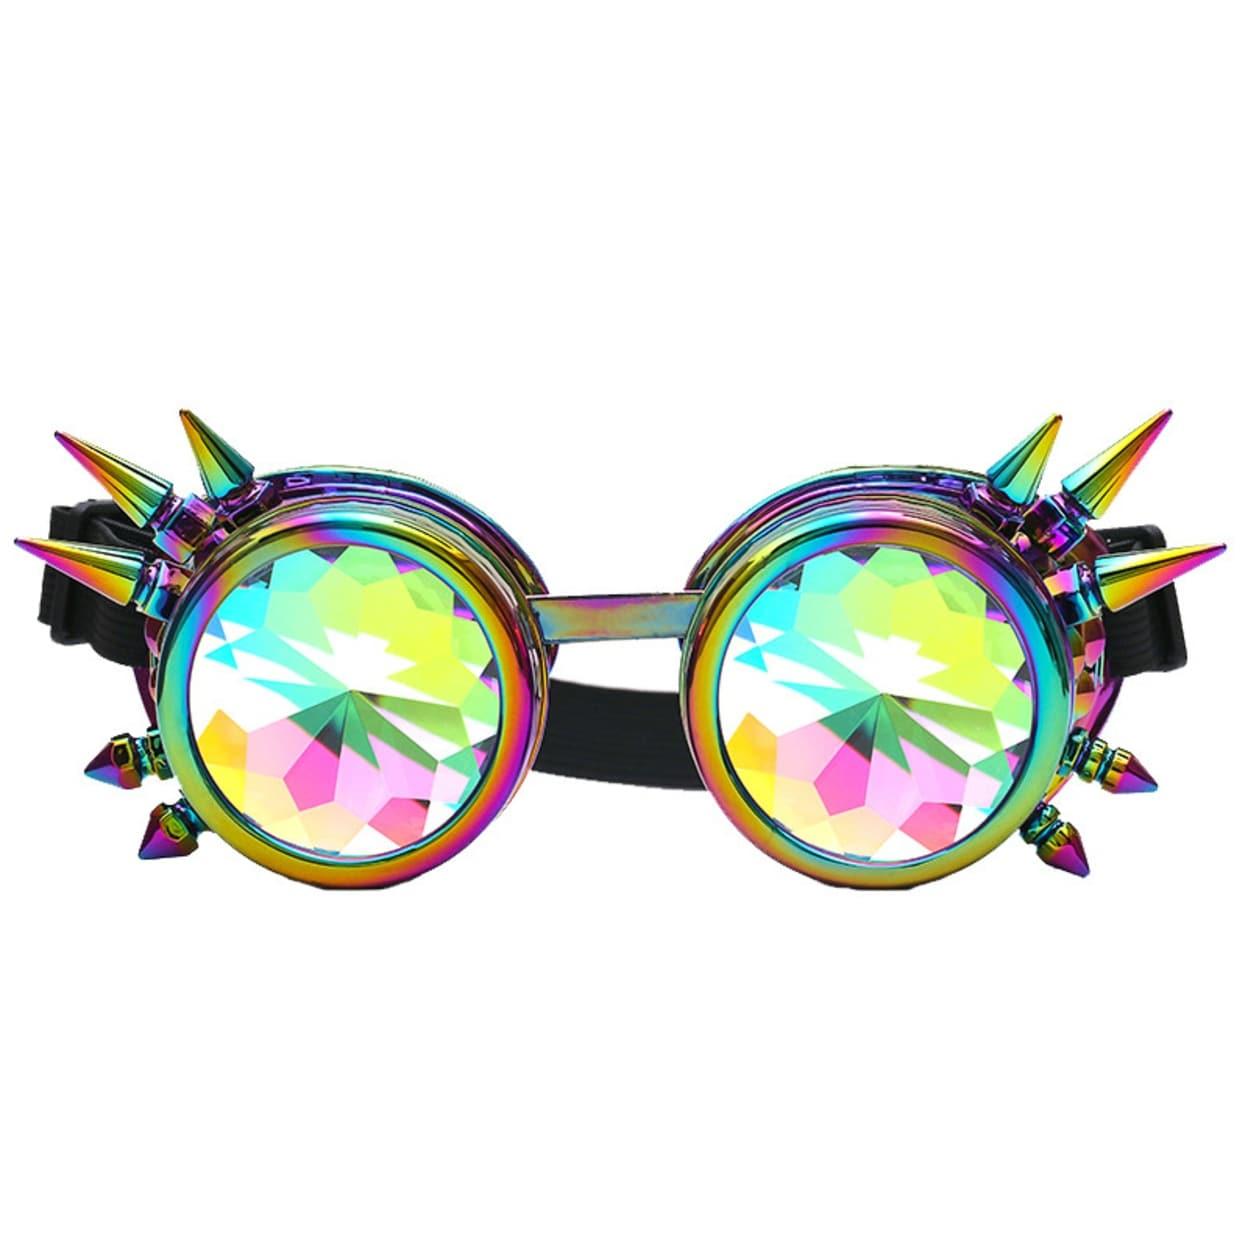 Kaleidoscope Round Crystal Lens Dance Rave Festival Party EDM Sunglasses Glasses